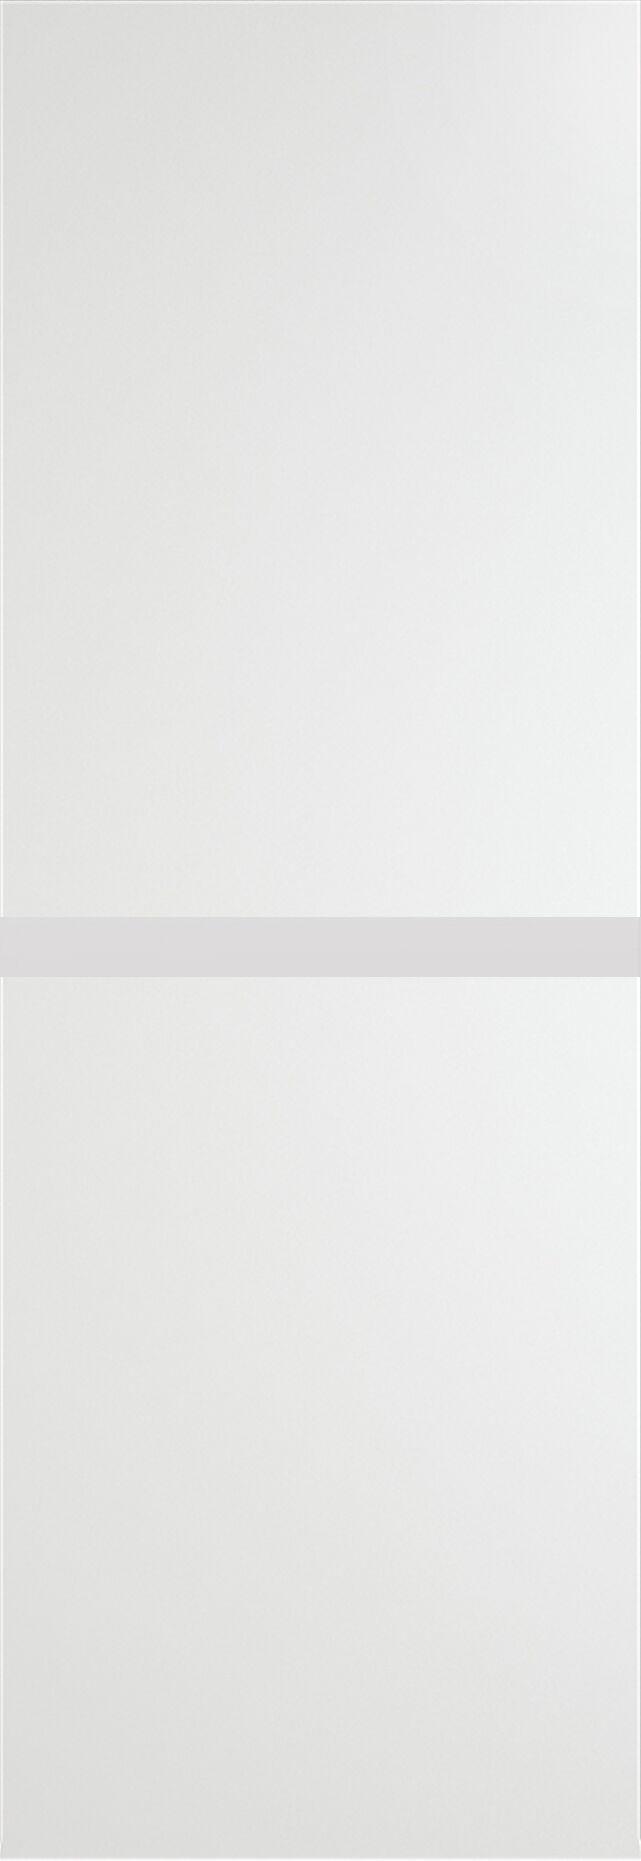 Tivoli Б-4 Invisible цвет - Белая эмаль Без стекла (ДГ)